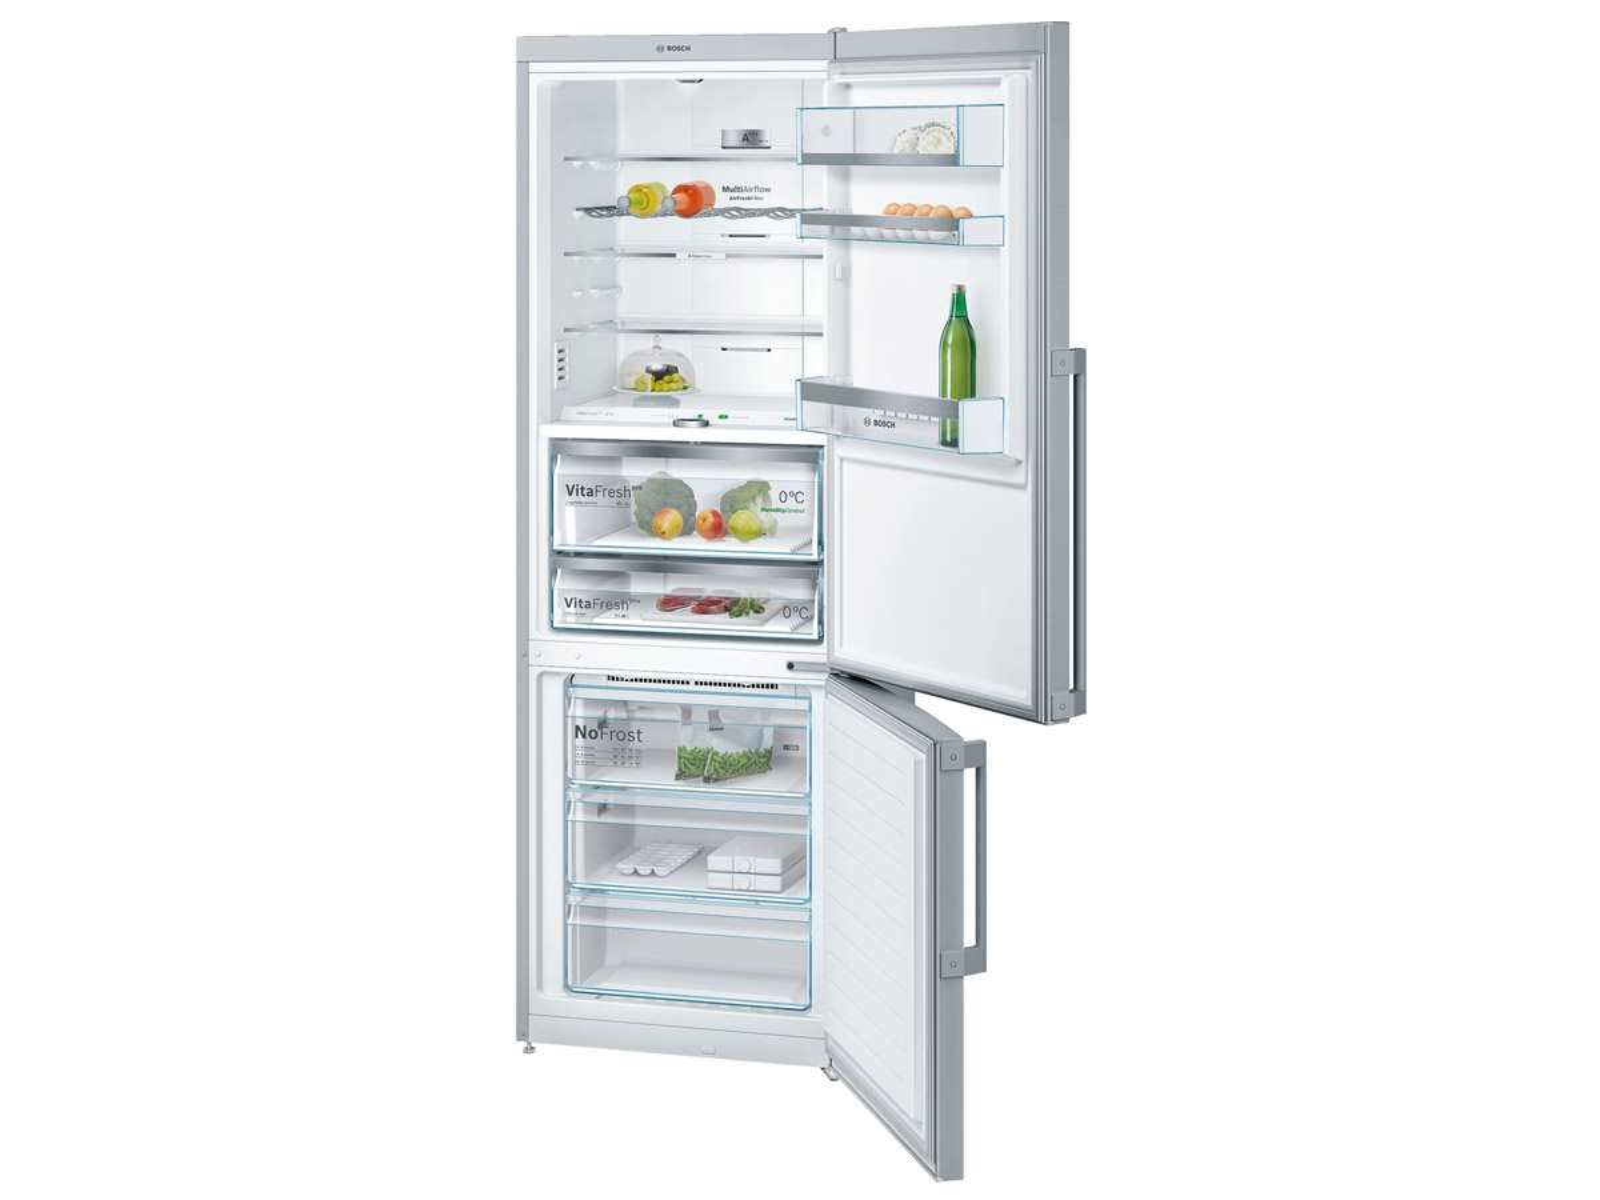 Amica Kühlschrank Linksanschlag : Bosch retro kühlschrank türanschlag links smeg retro kühlschrank